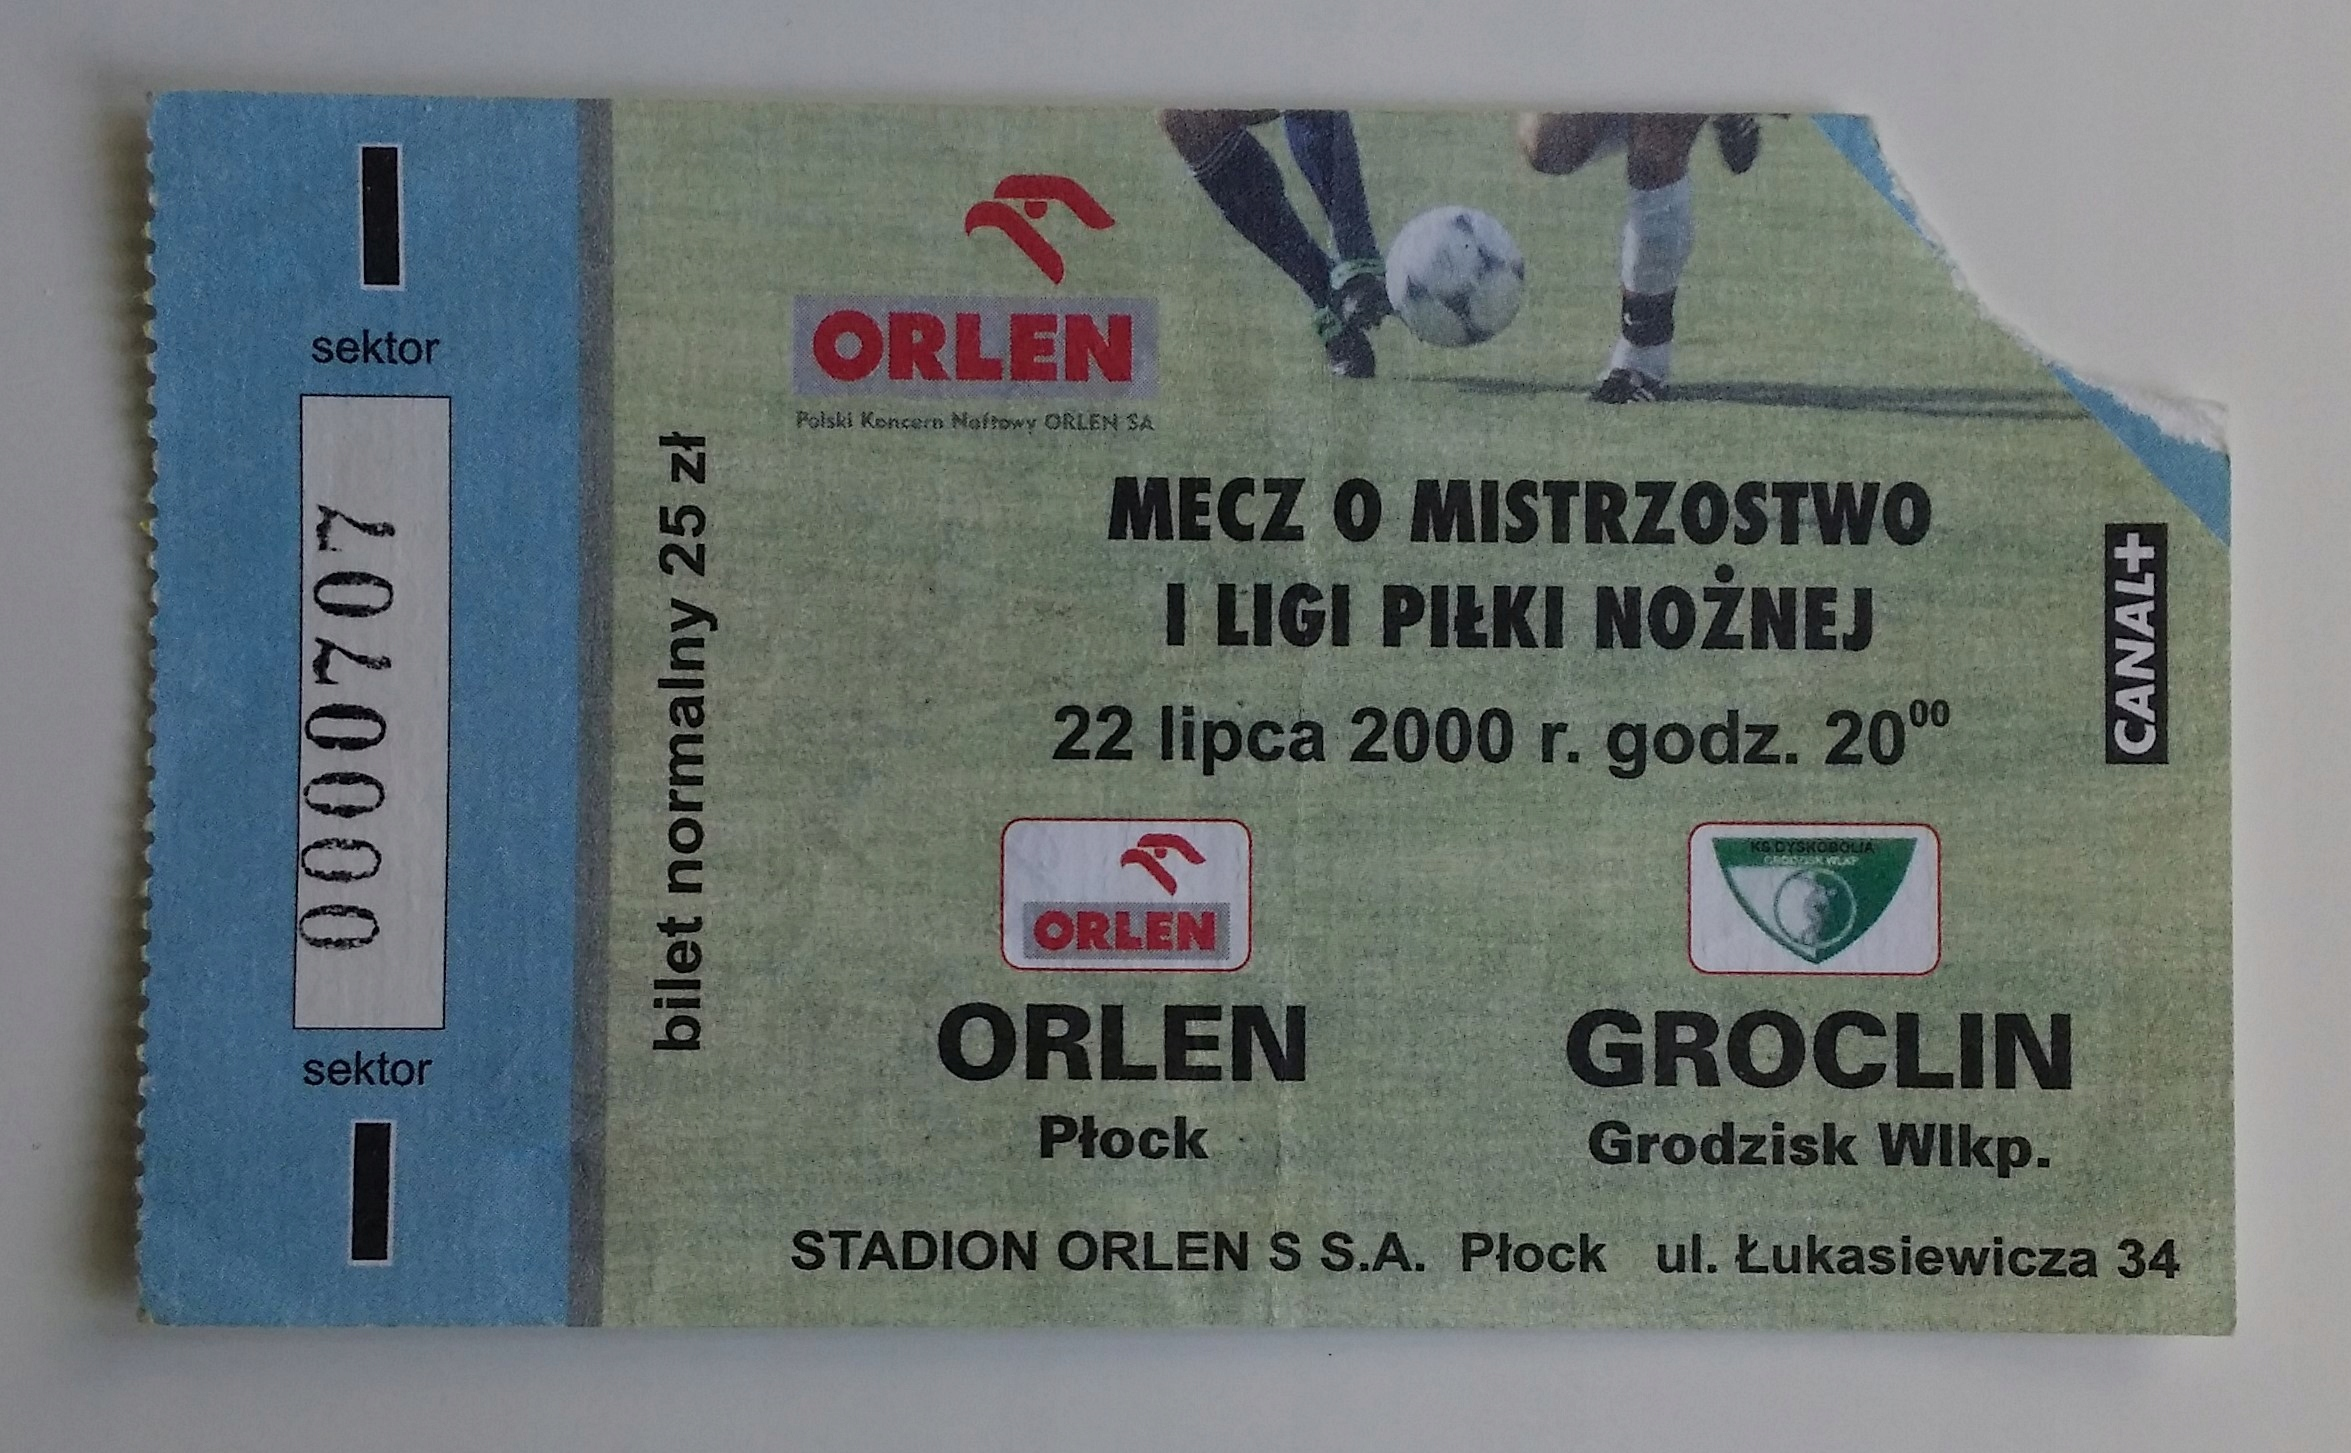 Bilet Orlen Płock - Groclin 22.07.2000